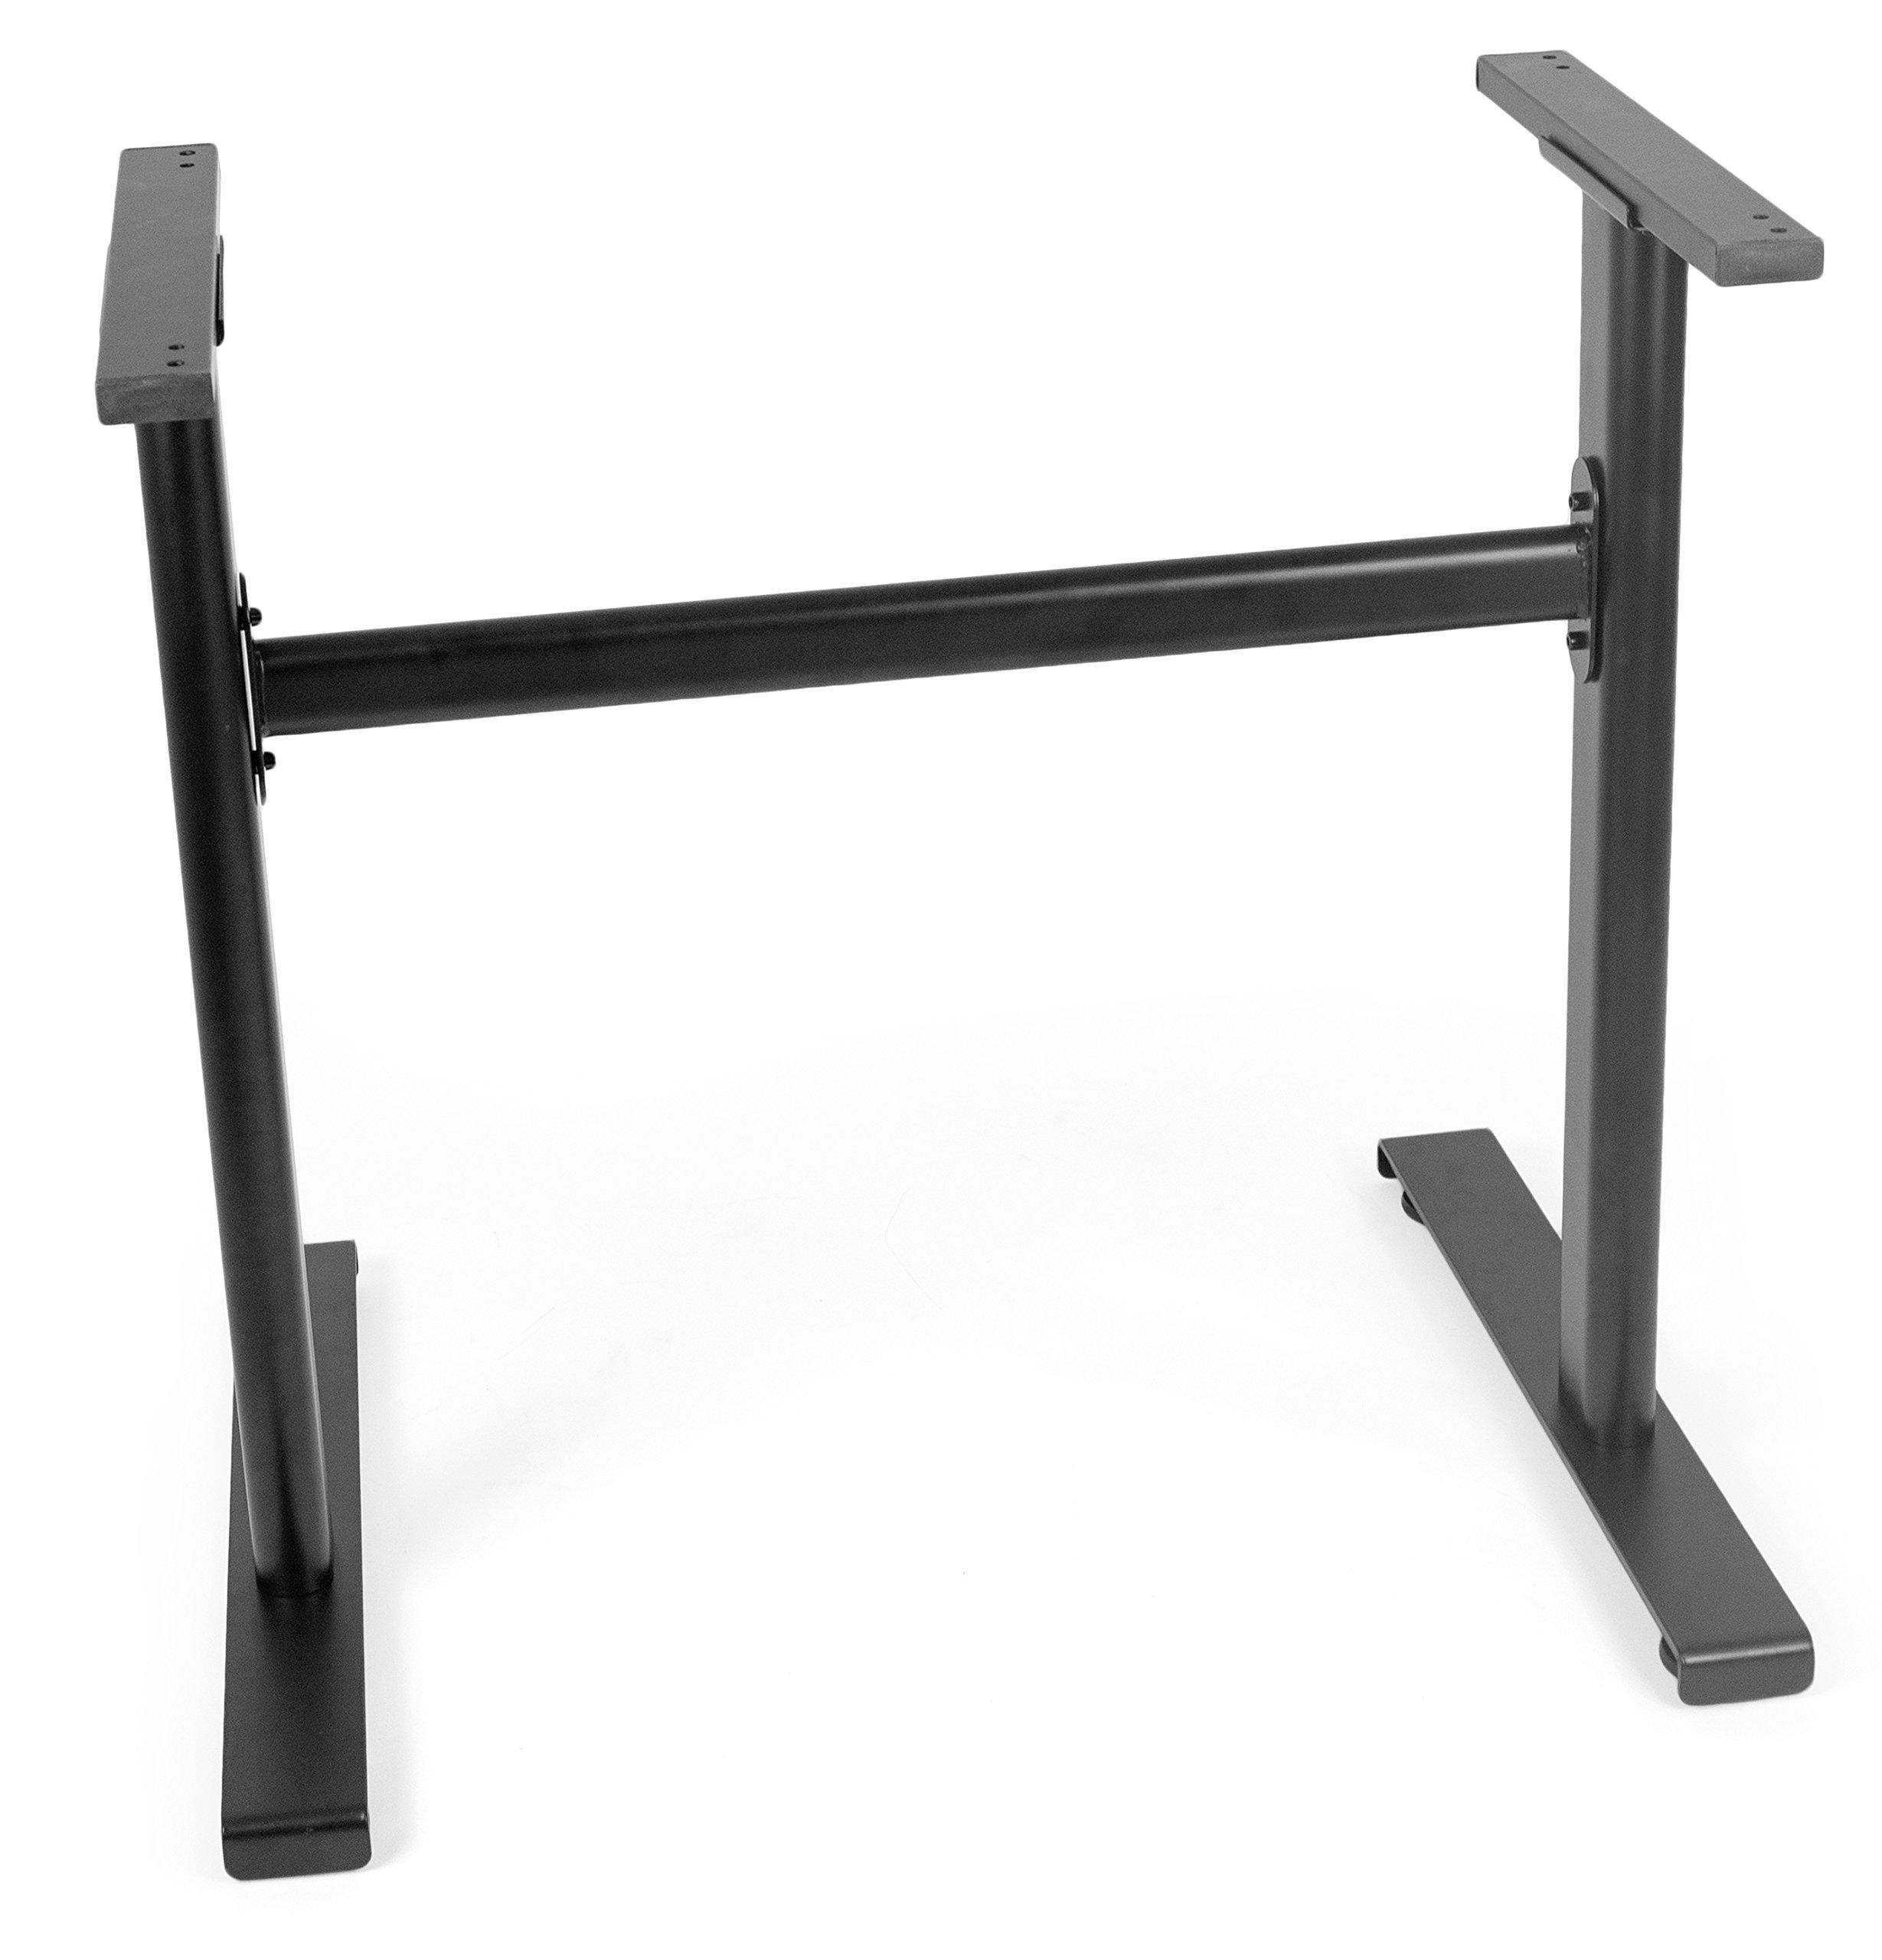 VIVO Black Heavy-Duty Platform Frame Designed for Models DESK-V000K and DESK-V001KE Adjustable Risers   Desk Legs (DESK-LEGS1K)